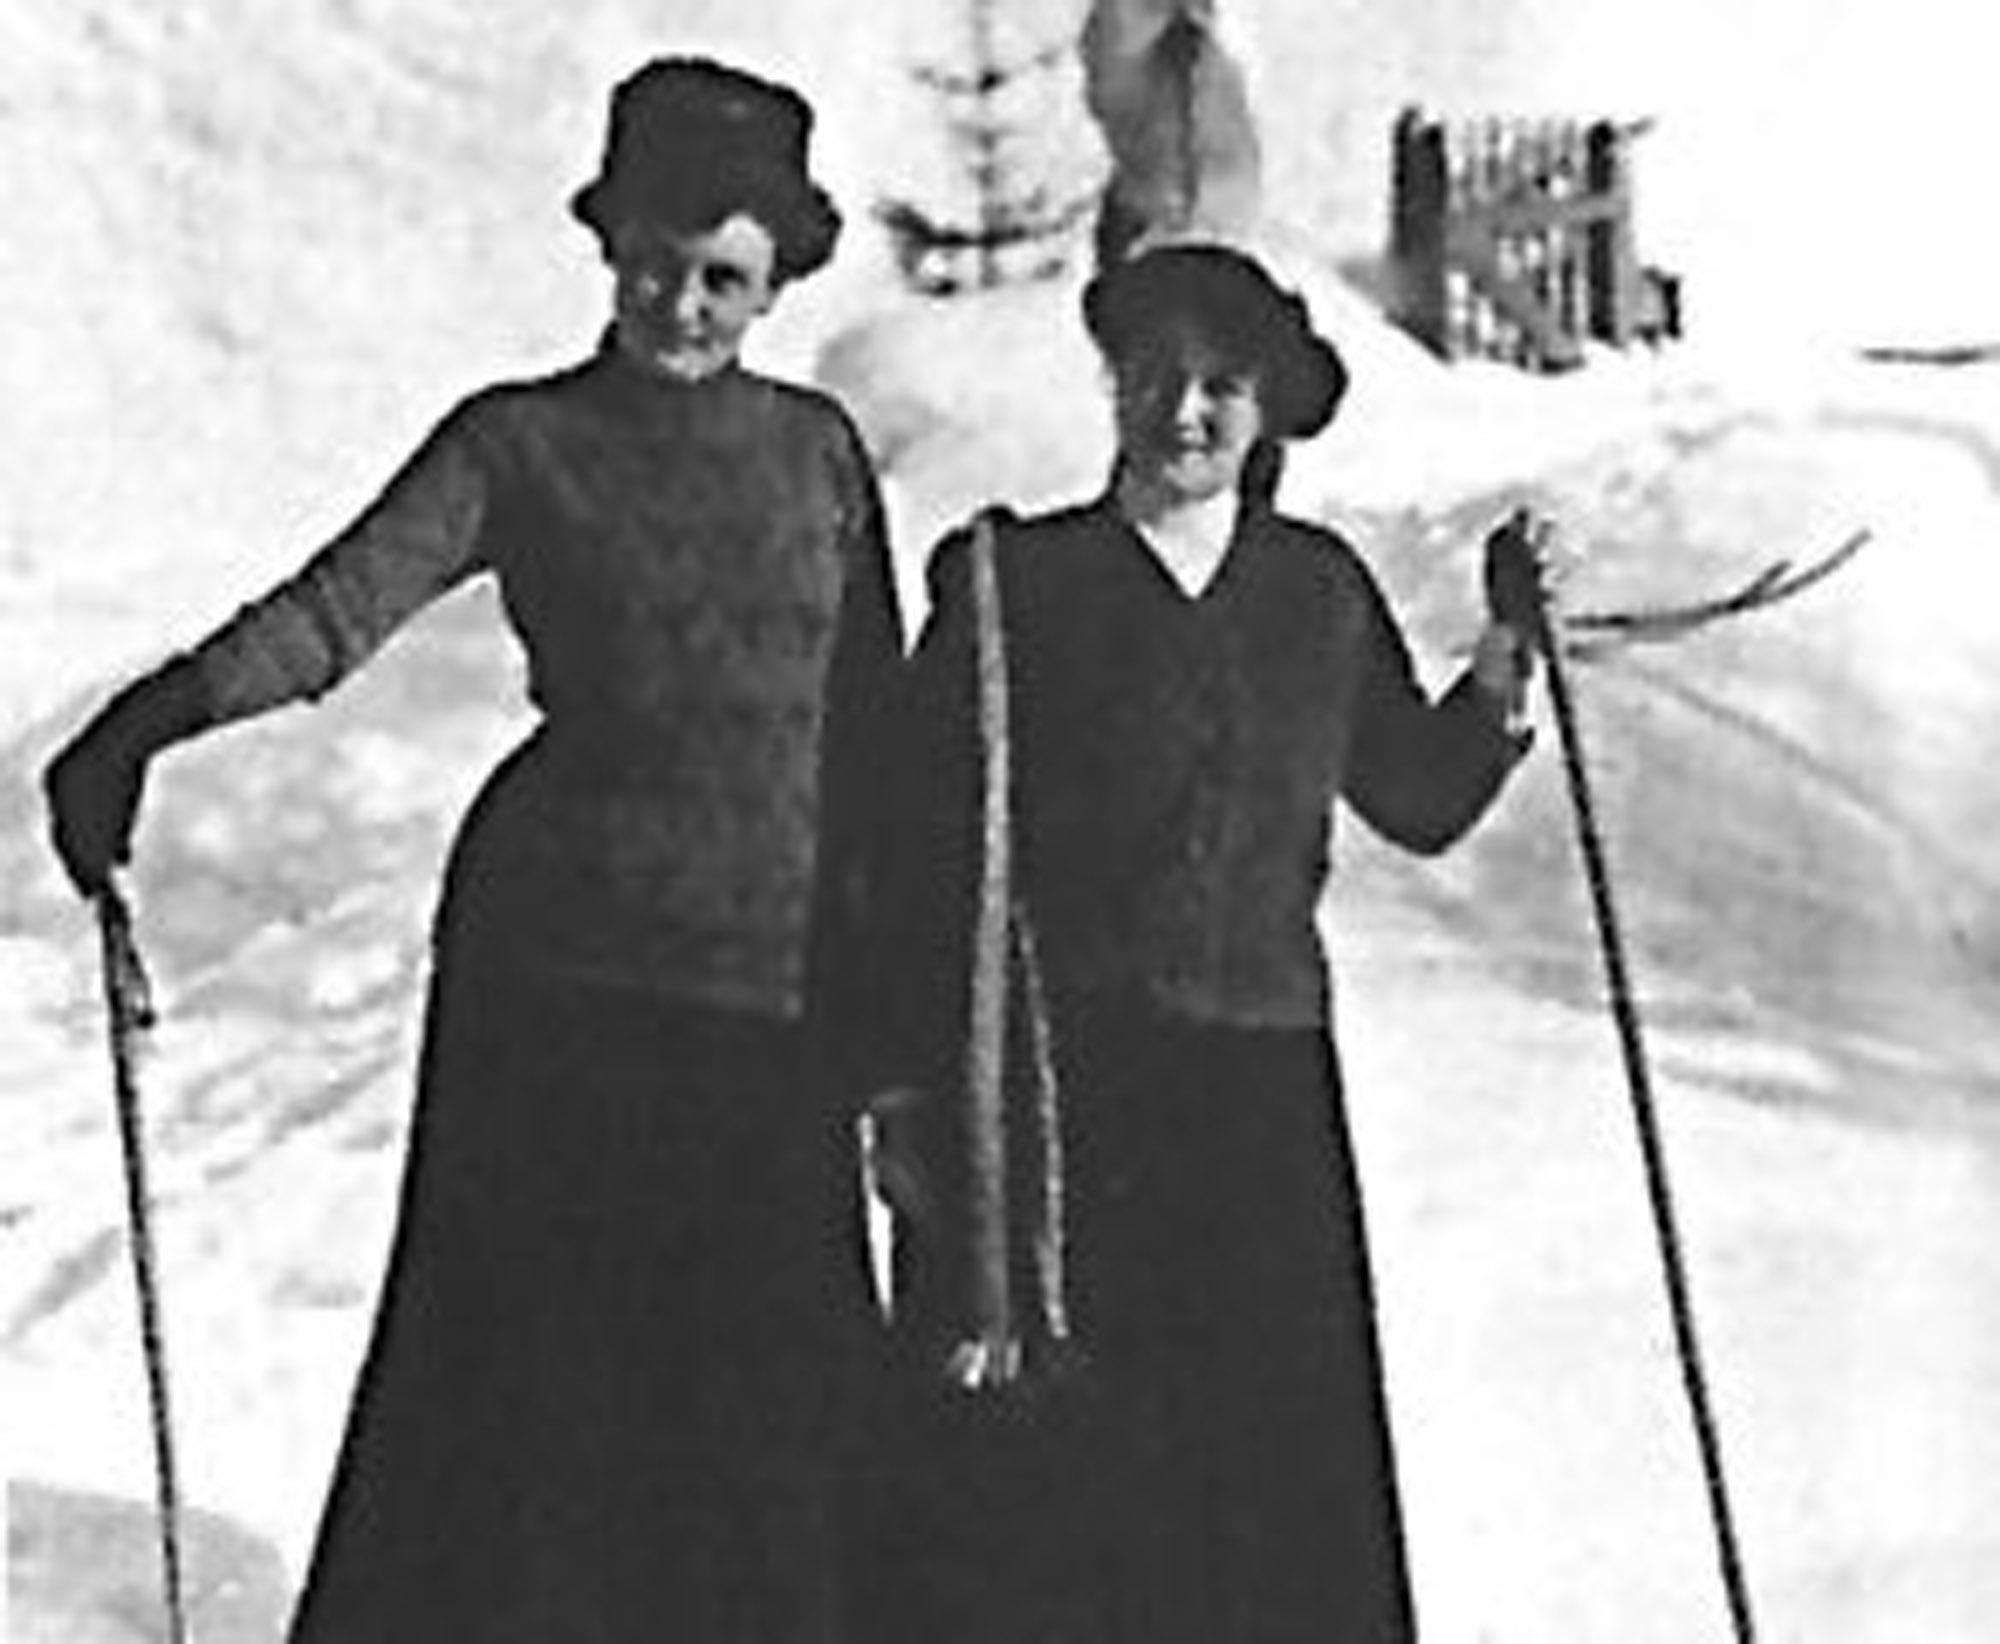 Komperdell 1922